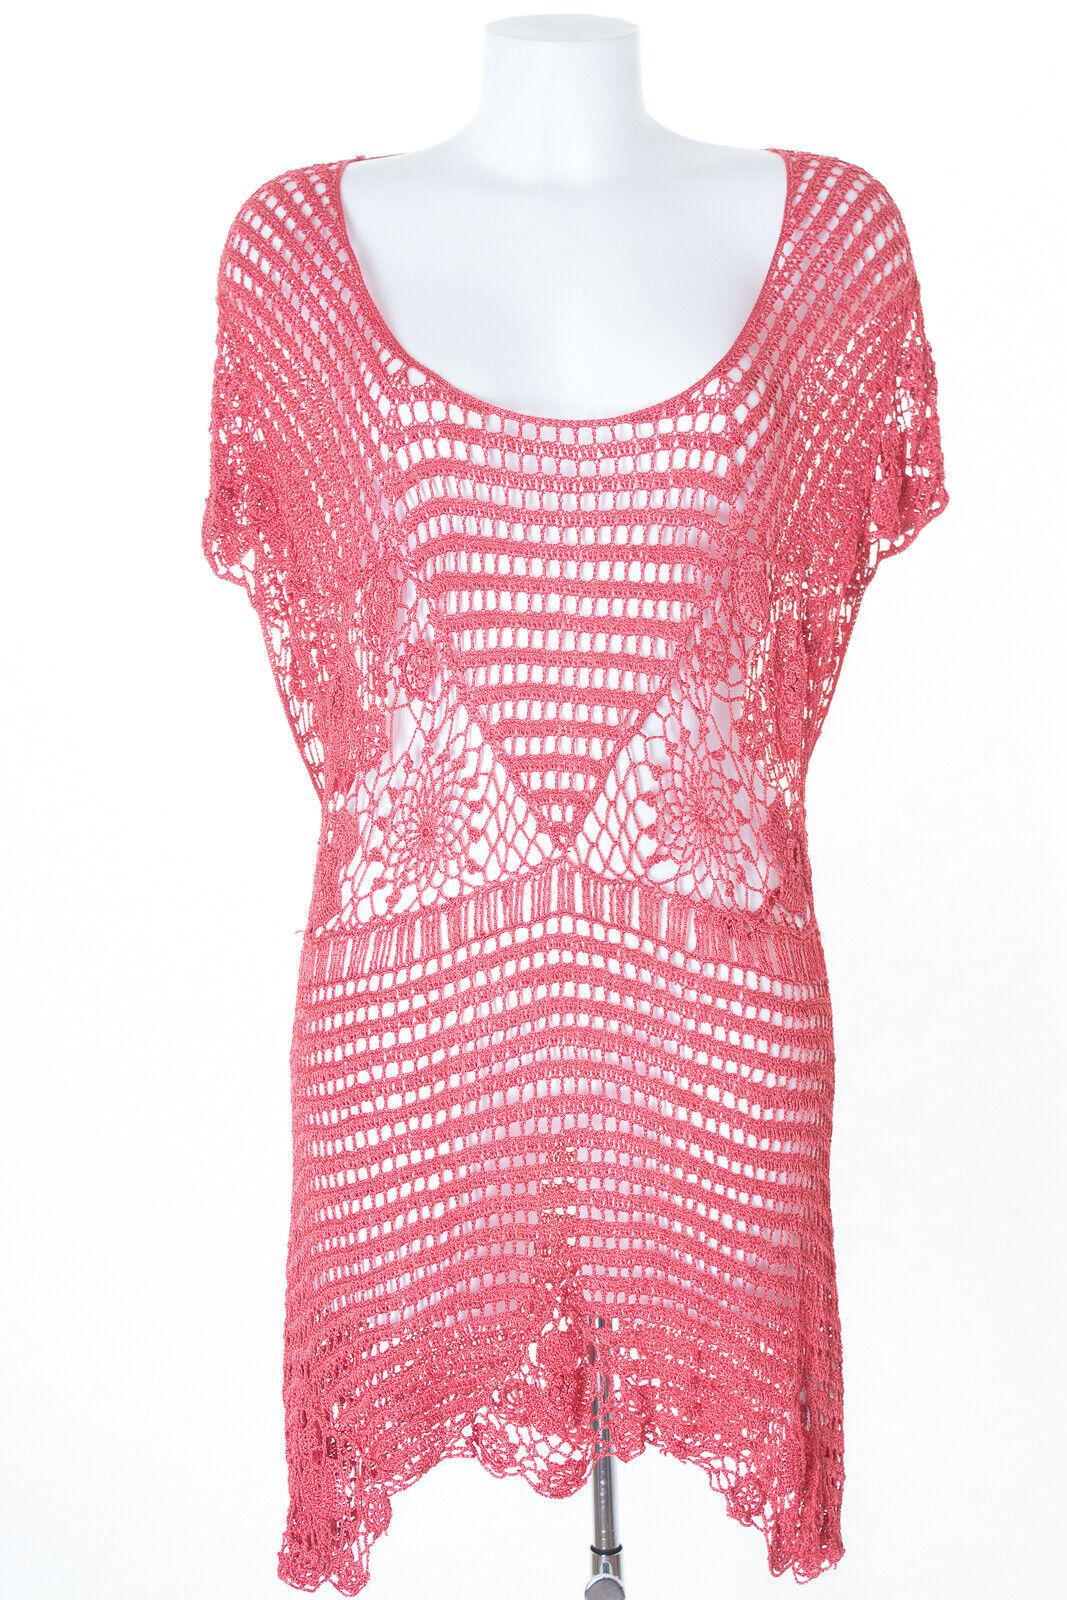 NICOWA Blause Blouse Shirt Knit Viskose Damen Gr. DE 42 in Rot